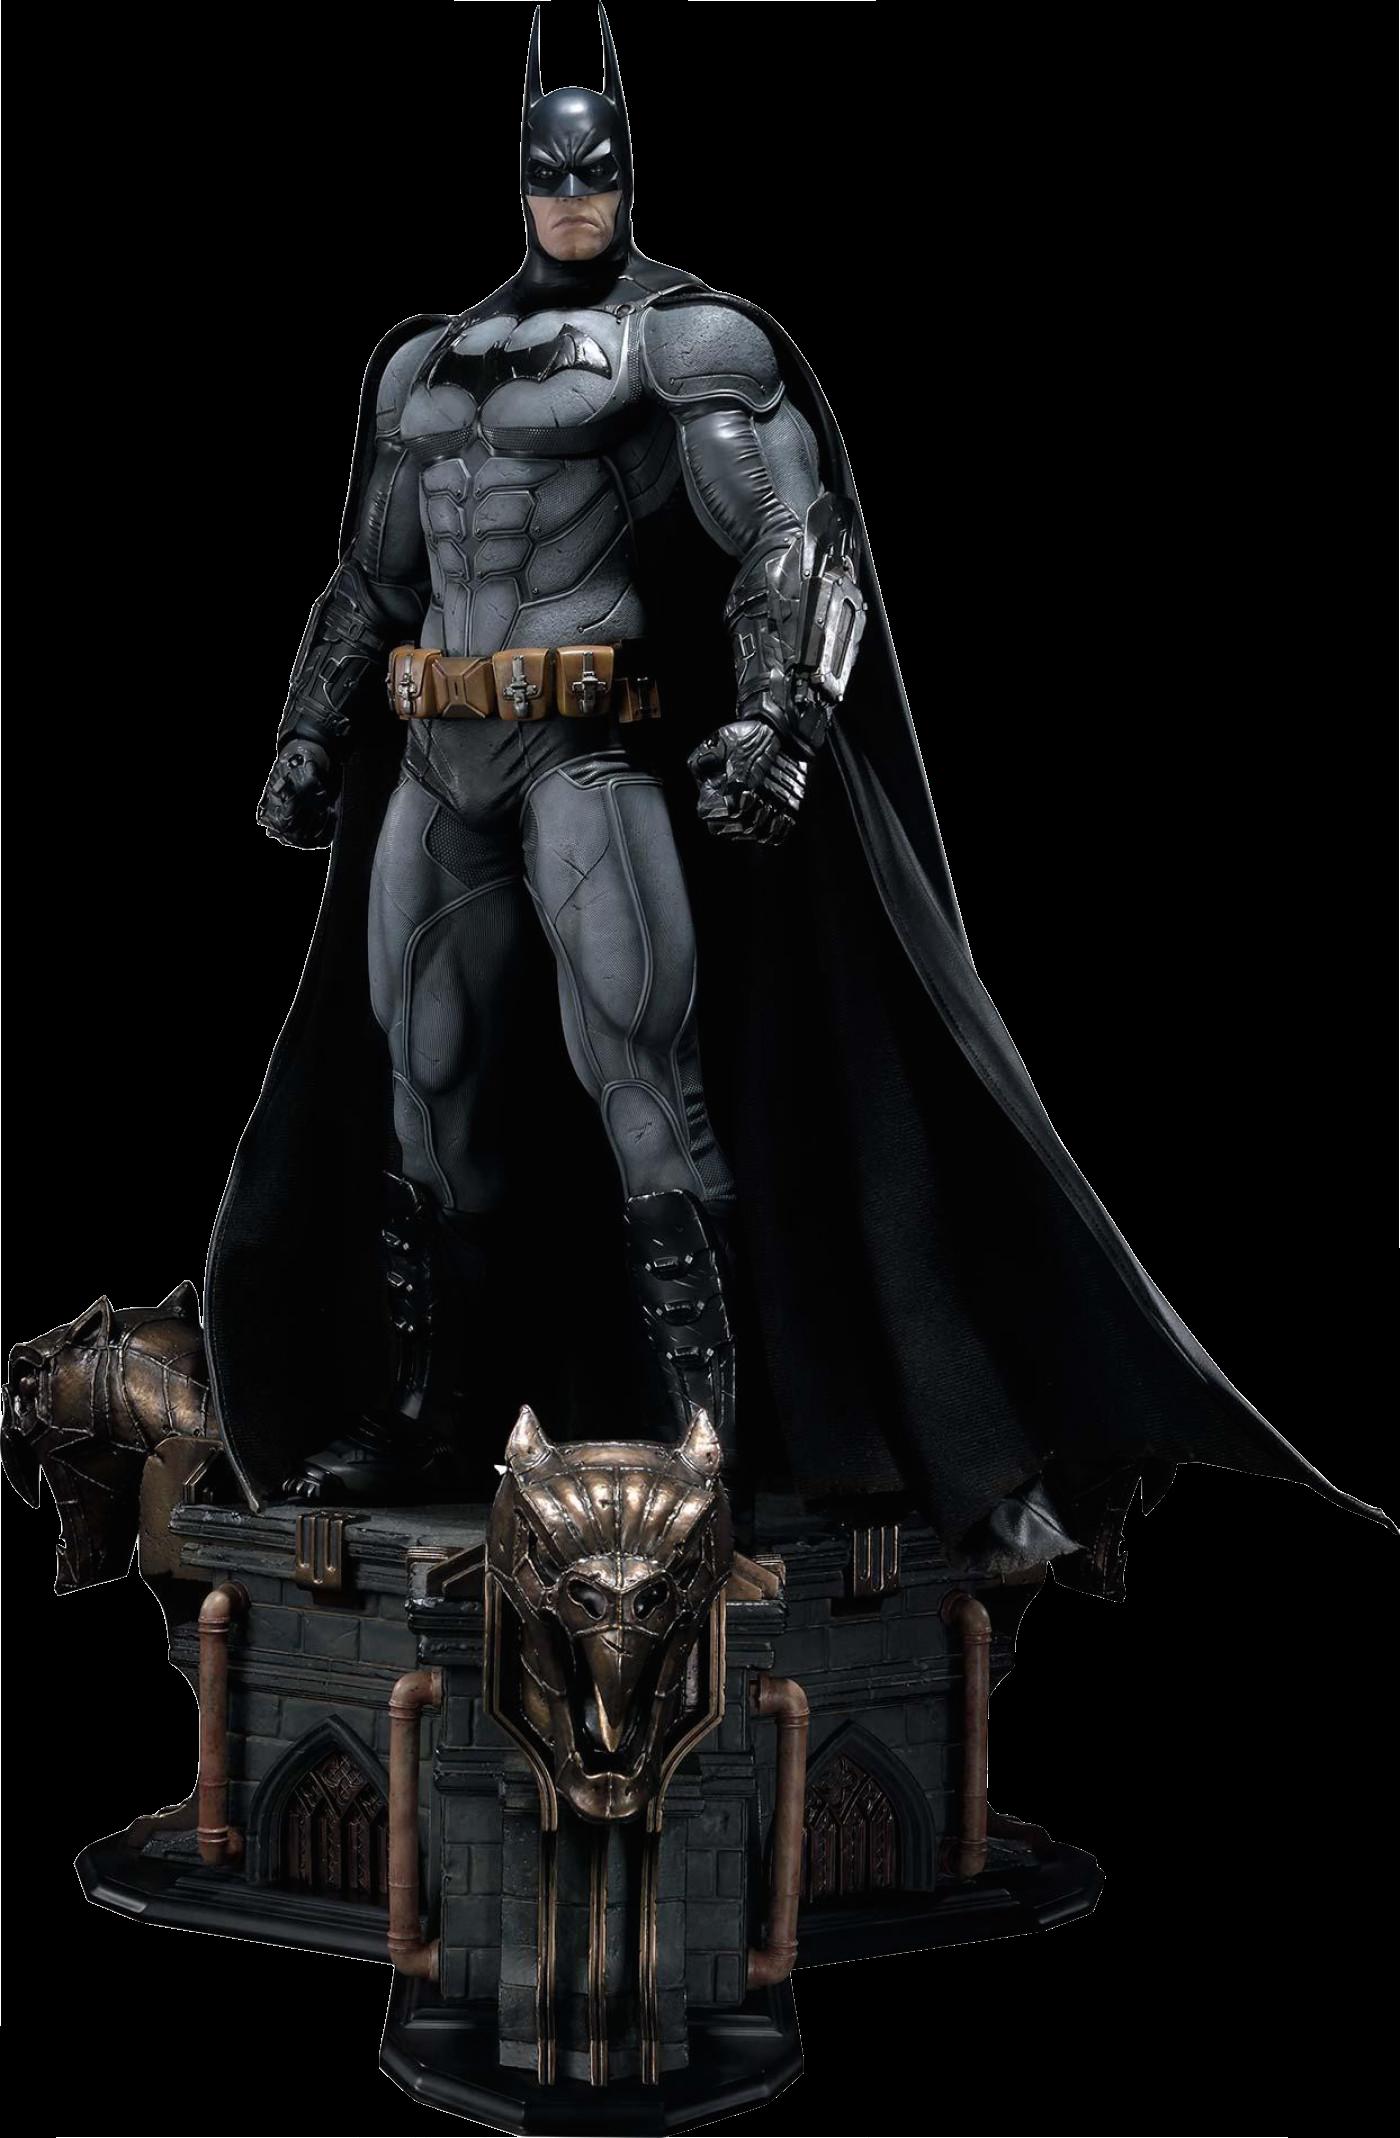 prime1-studio-dc-batman-arkham-knight-batman-suit-7.43-toyslife